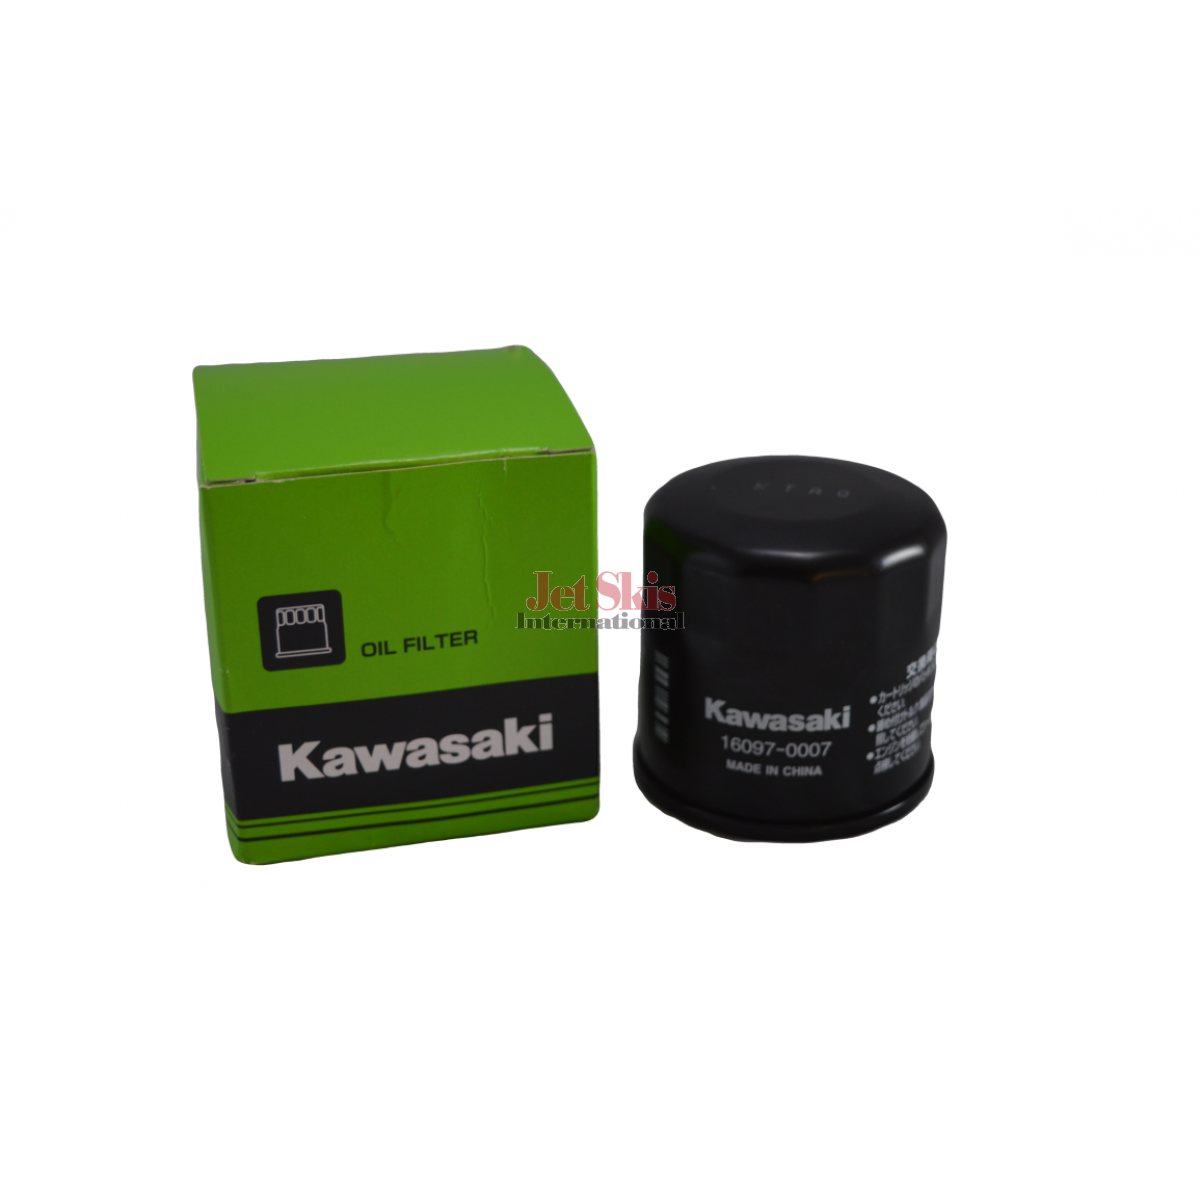 Kawasaki Ultra X Oil Filter